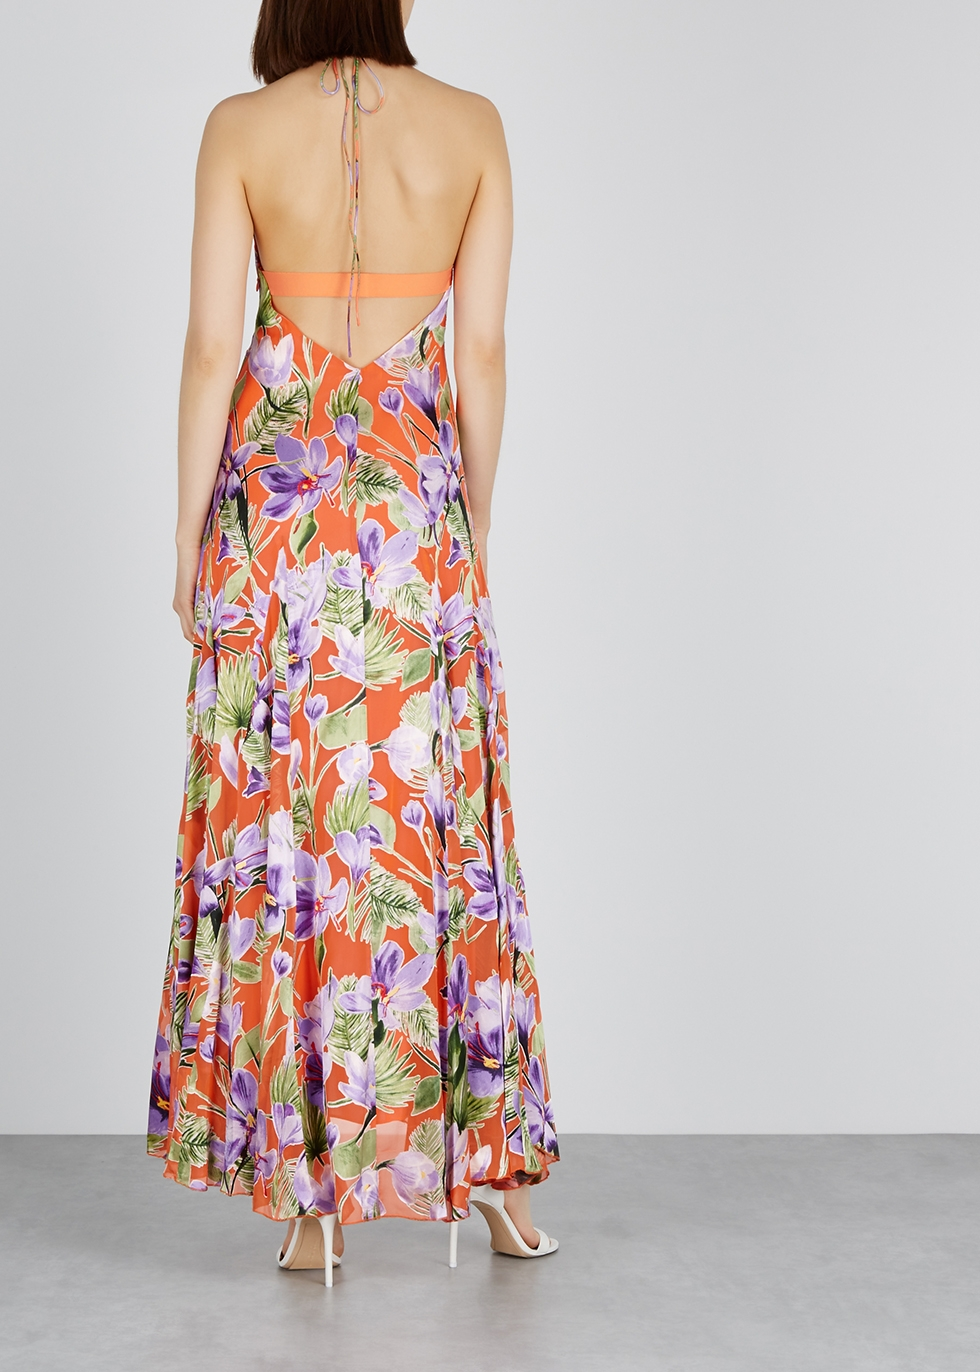 Floral Maxi Harvey Nichols AliceOlivia Devoré Dress Hetty tQxhrBsdC